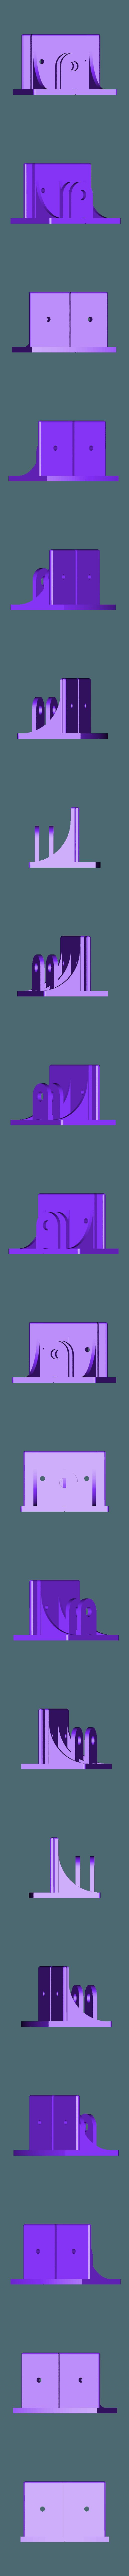 NSKB-80-bottom-v2_repaired.stl Télécharger fichier STL gratuit Pièces 3D pour l'imprimante Ceramic DIY • Objet à imprimer en 3D, fgeer